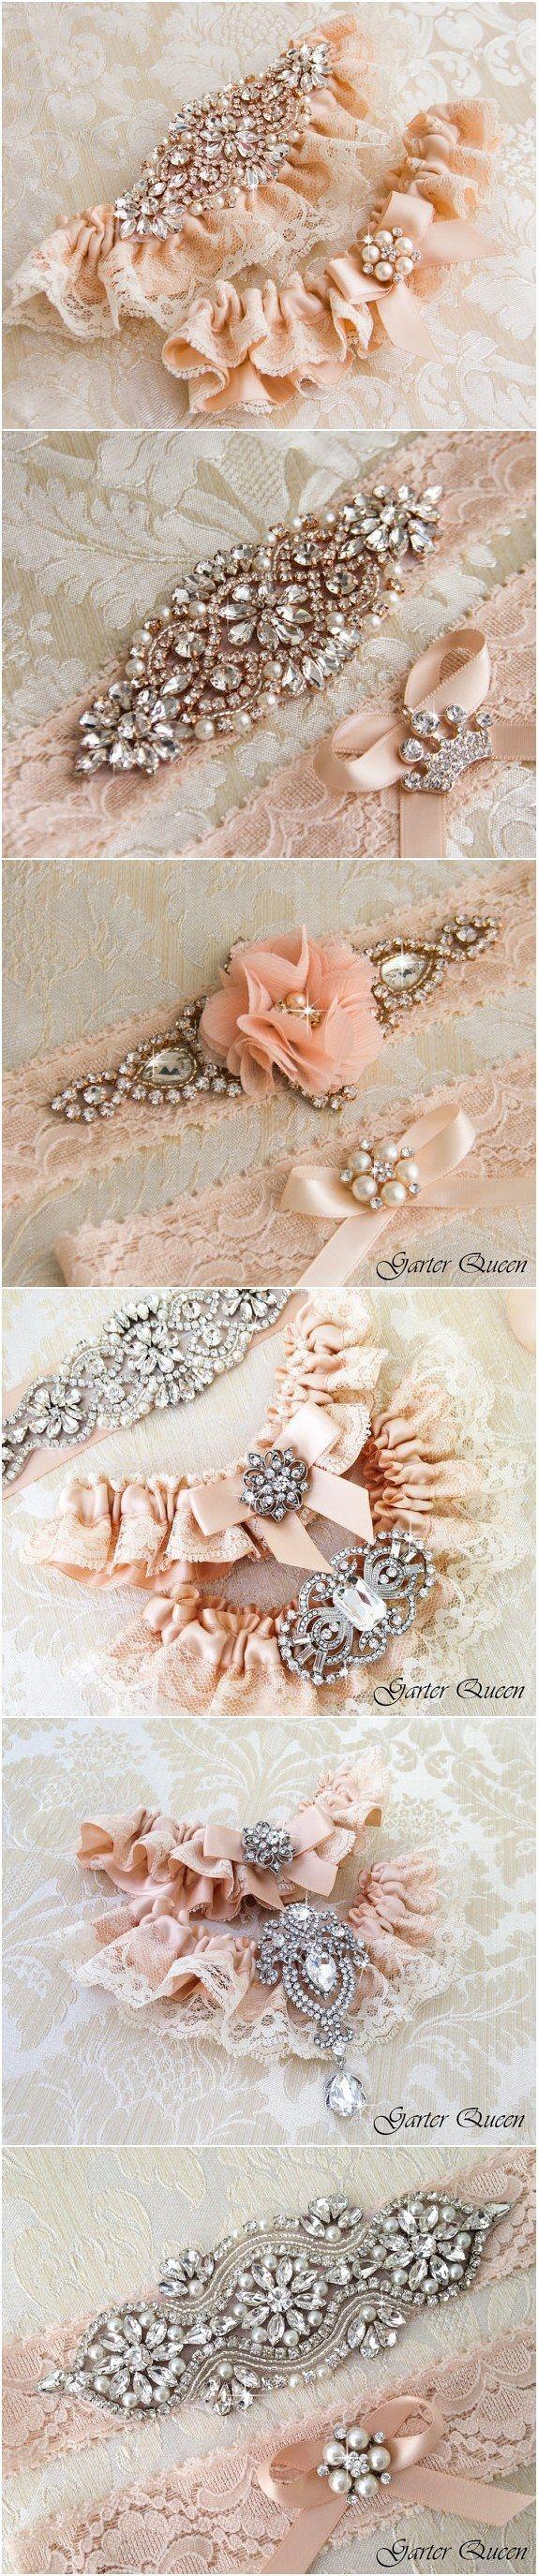 Blush Ivory Lace Wedding Garter Sets / http://www.deerpearlflowers.com/wedding-garters-sets-from-etsy/3/